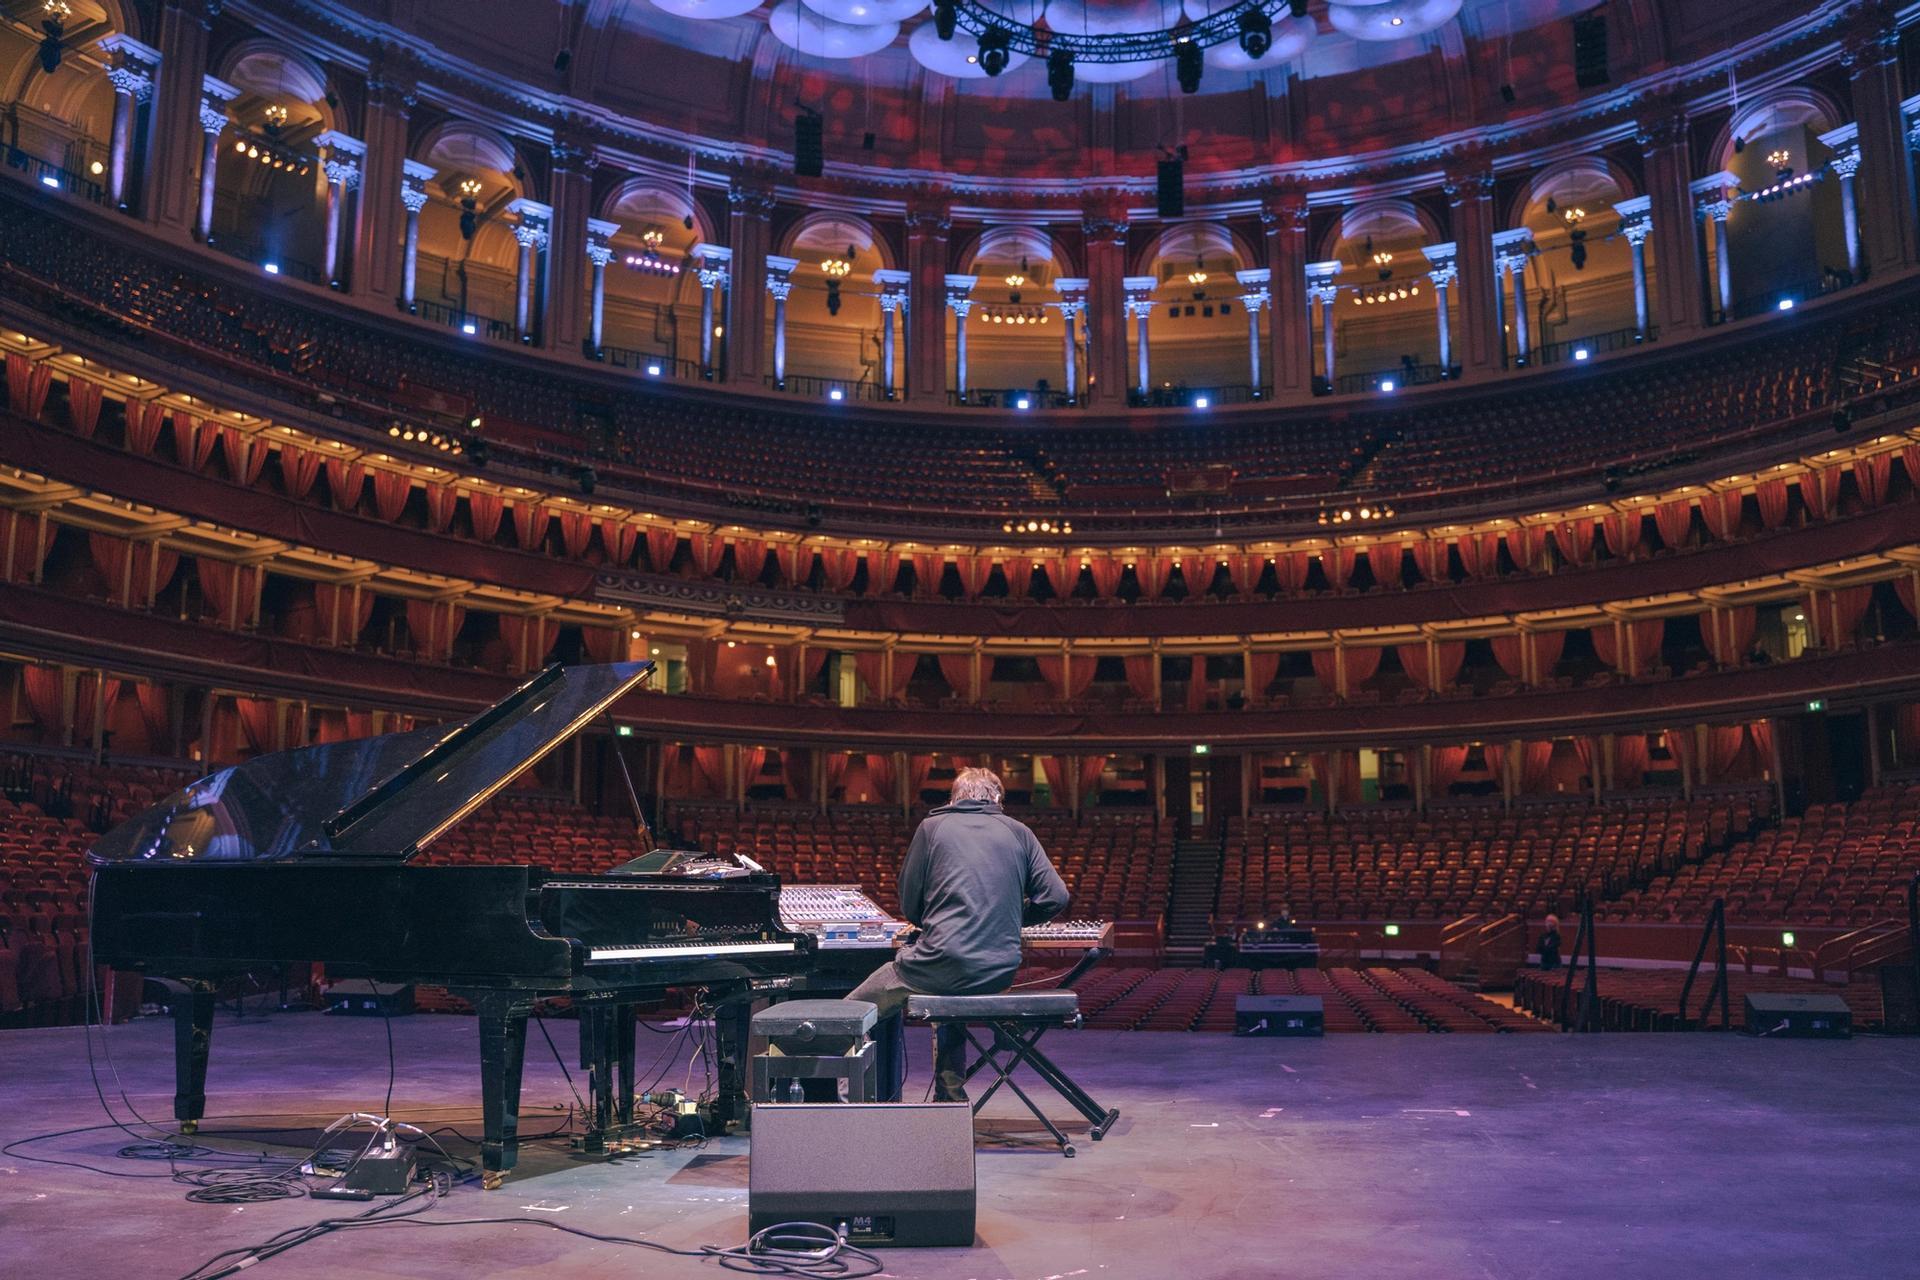 Royal Albert Hall Piano and Pianist